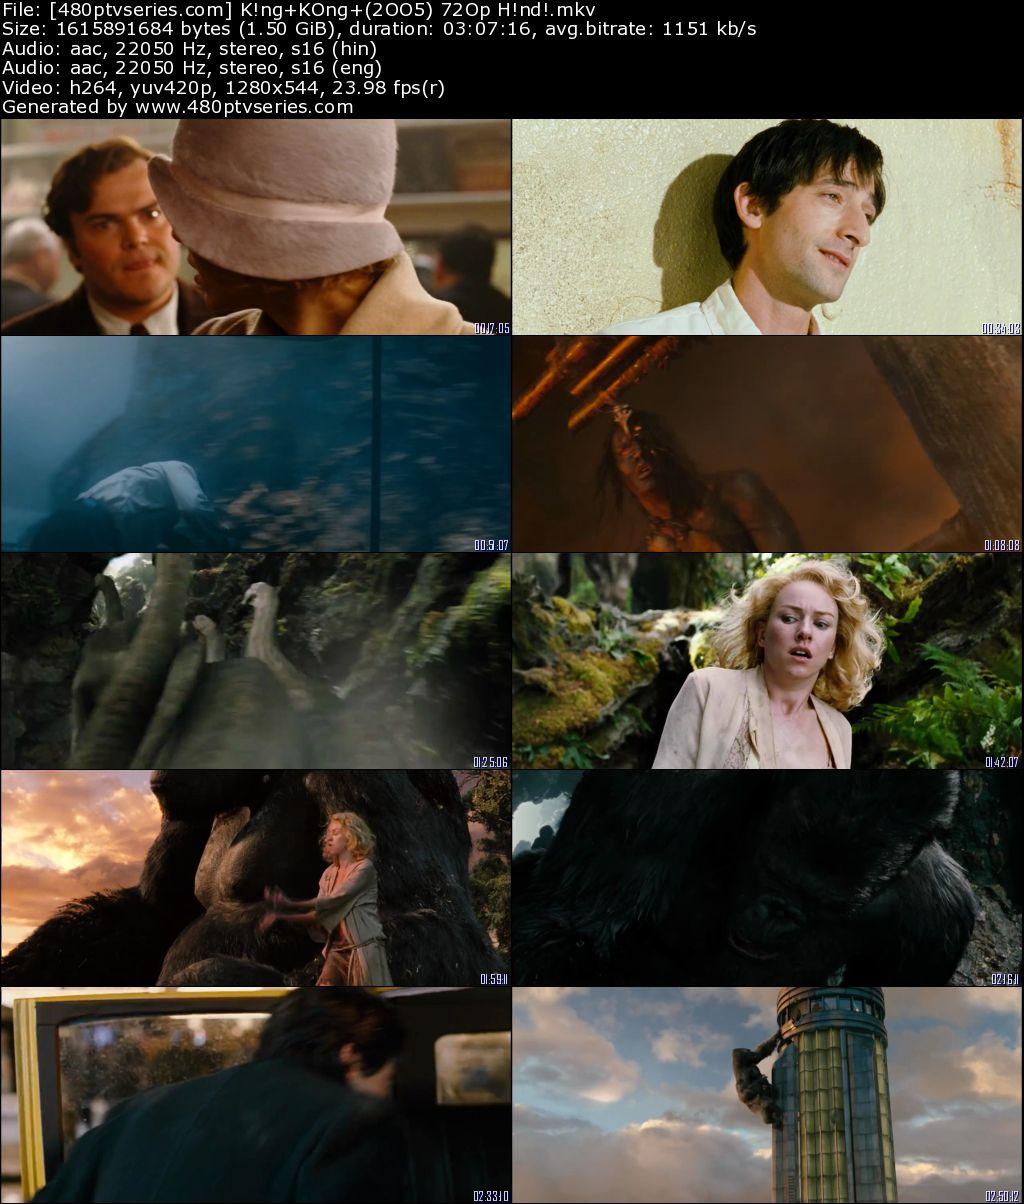 Download King Kong (2005) Full Hindi Dual Audio Movie Download 720p Bluray Free Watch Online Full Movie Download Worldfree4u 9xmovies